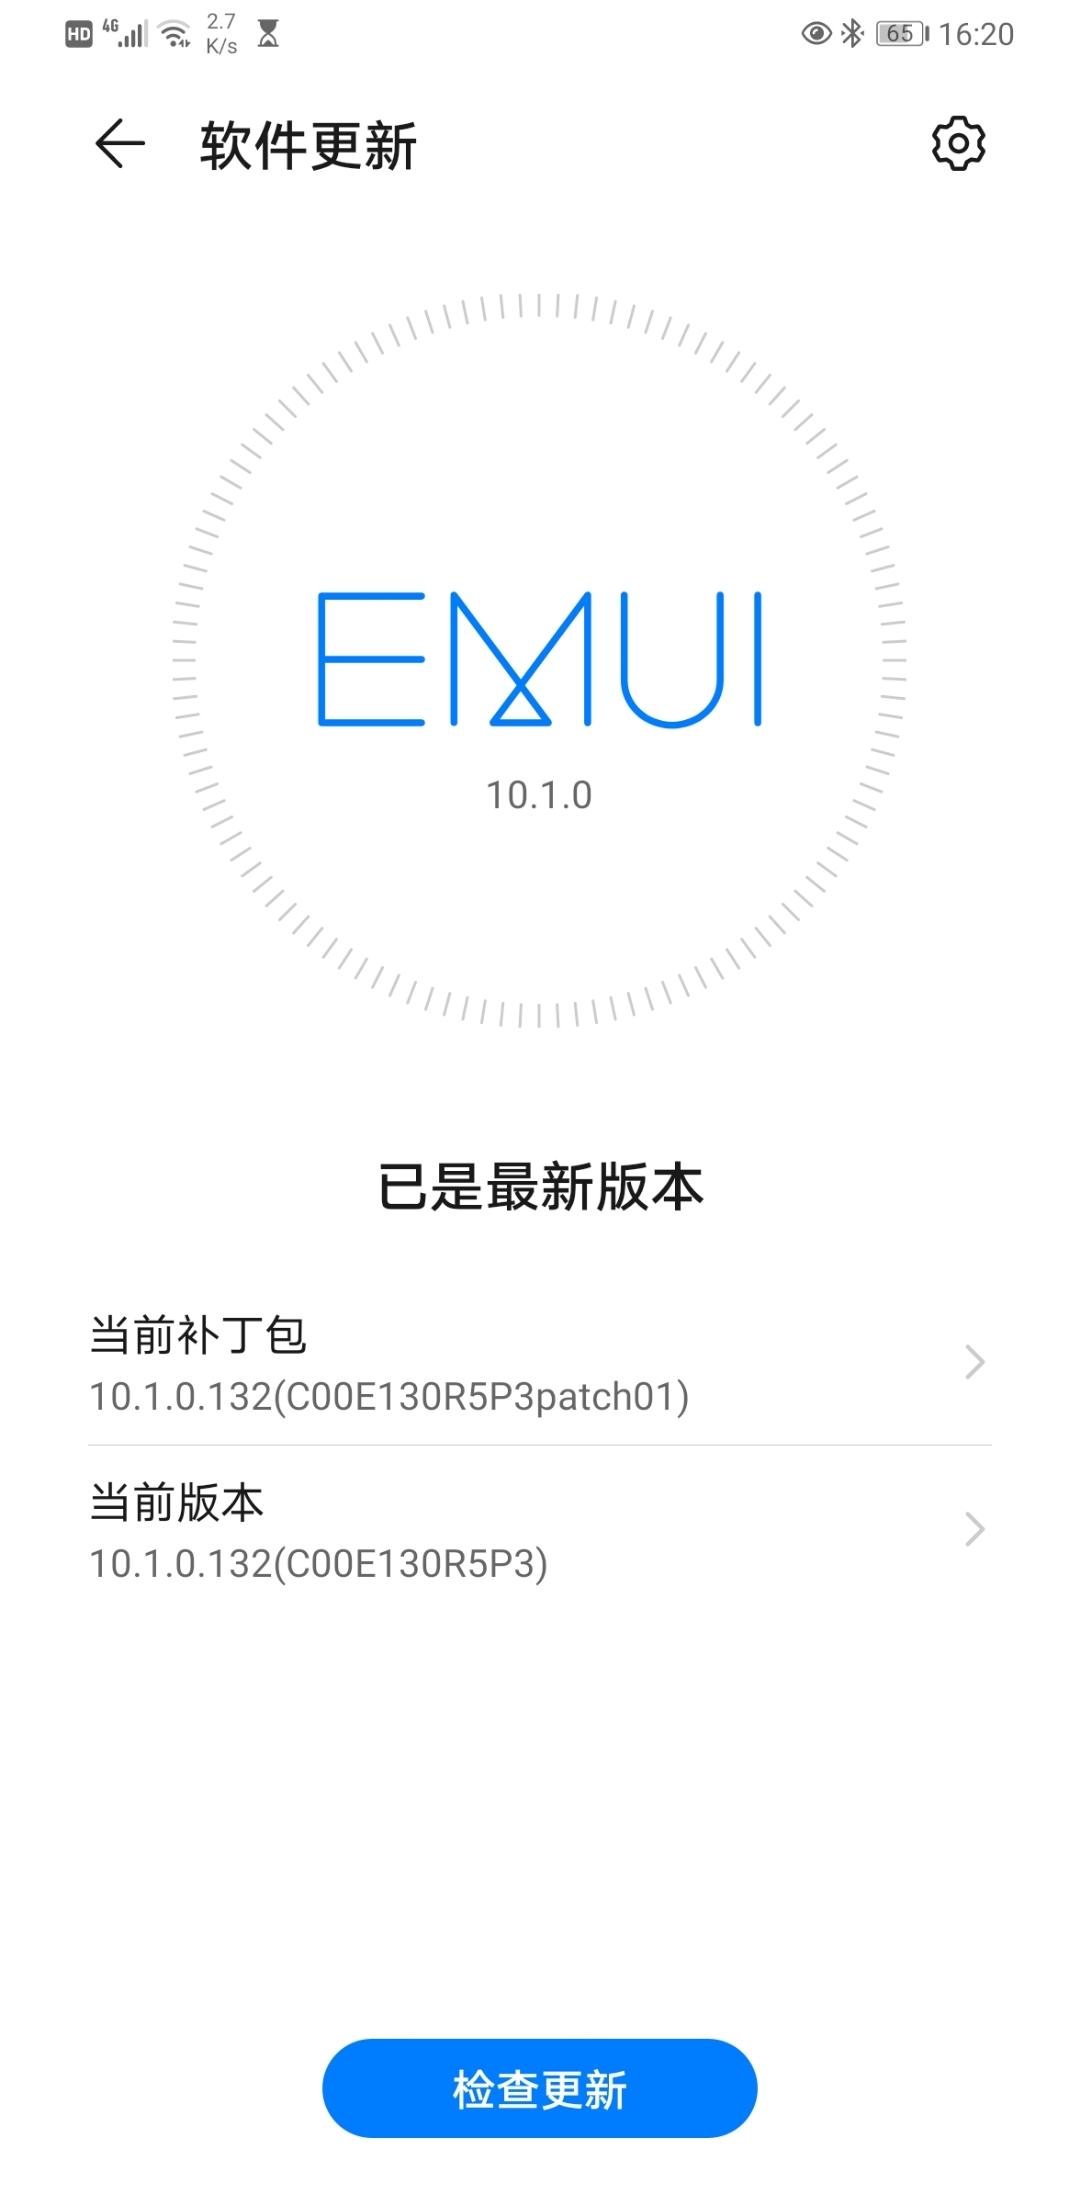 Screenshot_20200514_162012_com.huawei.android.hwouc.jpg